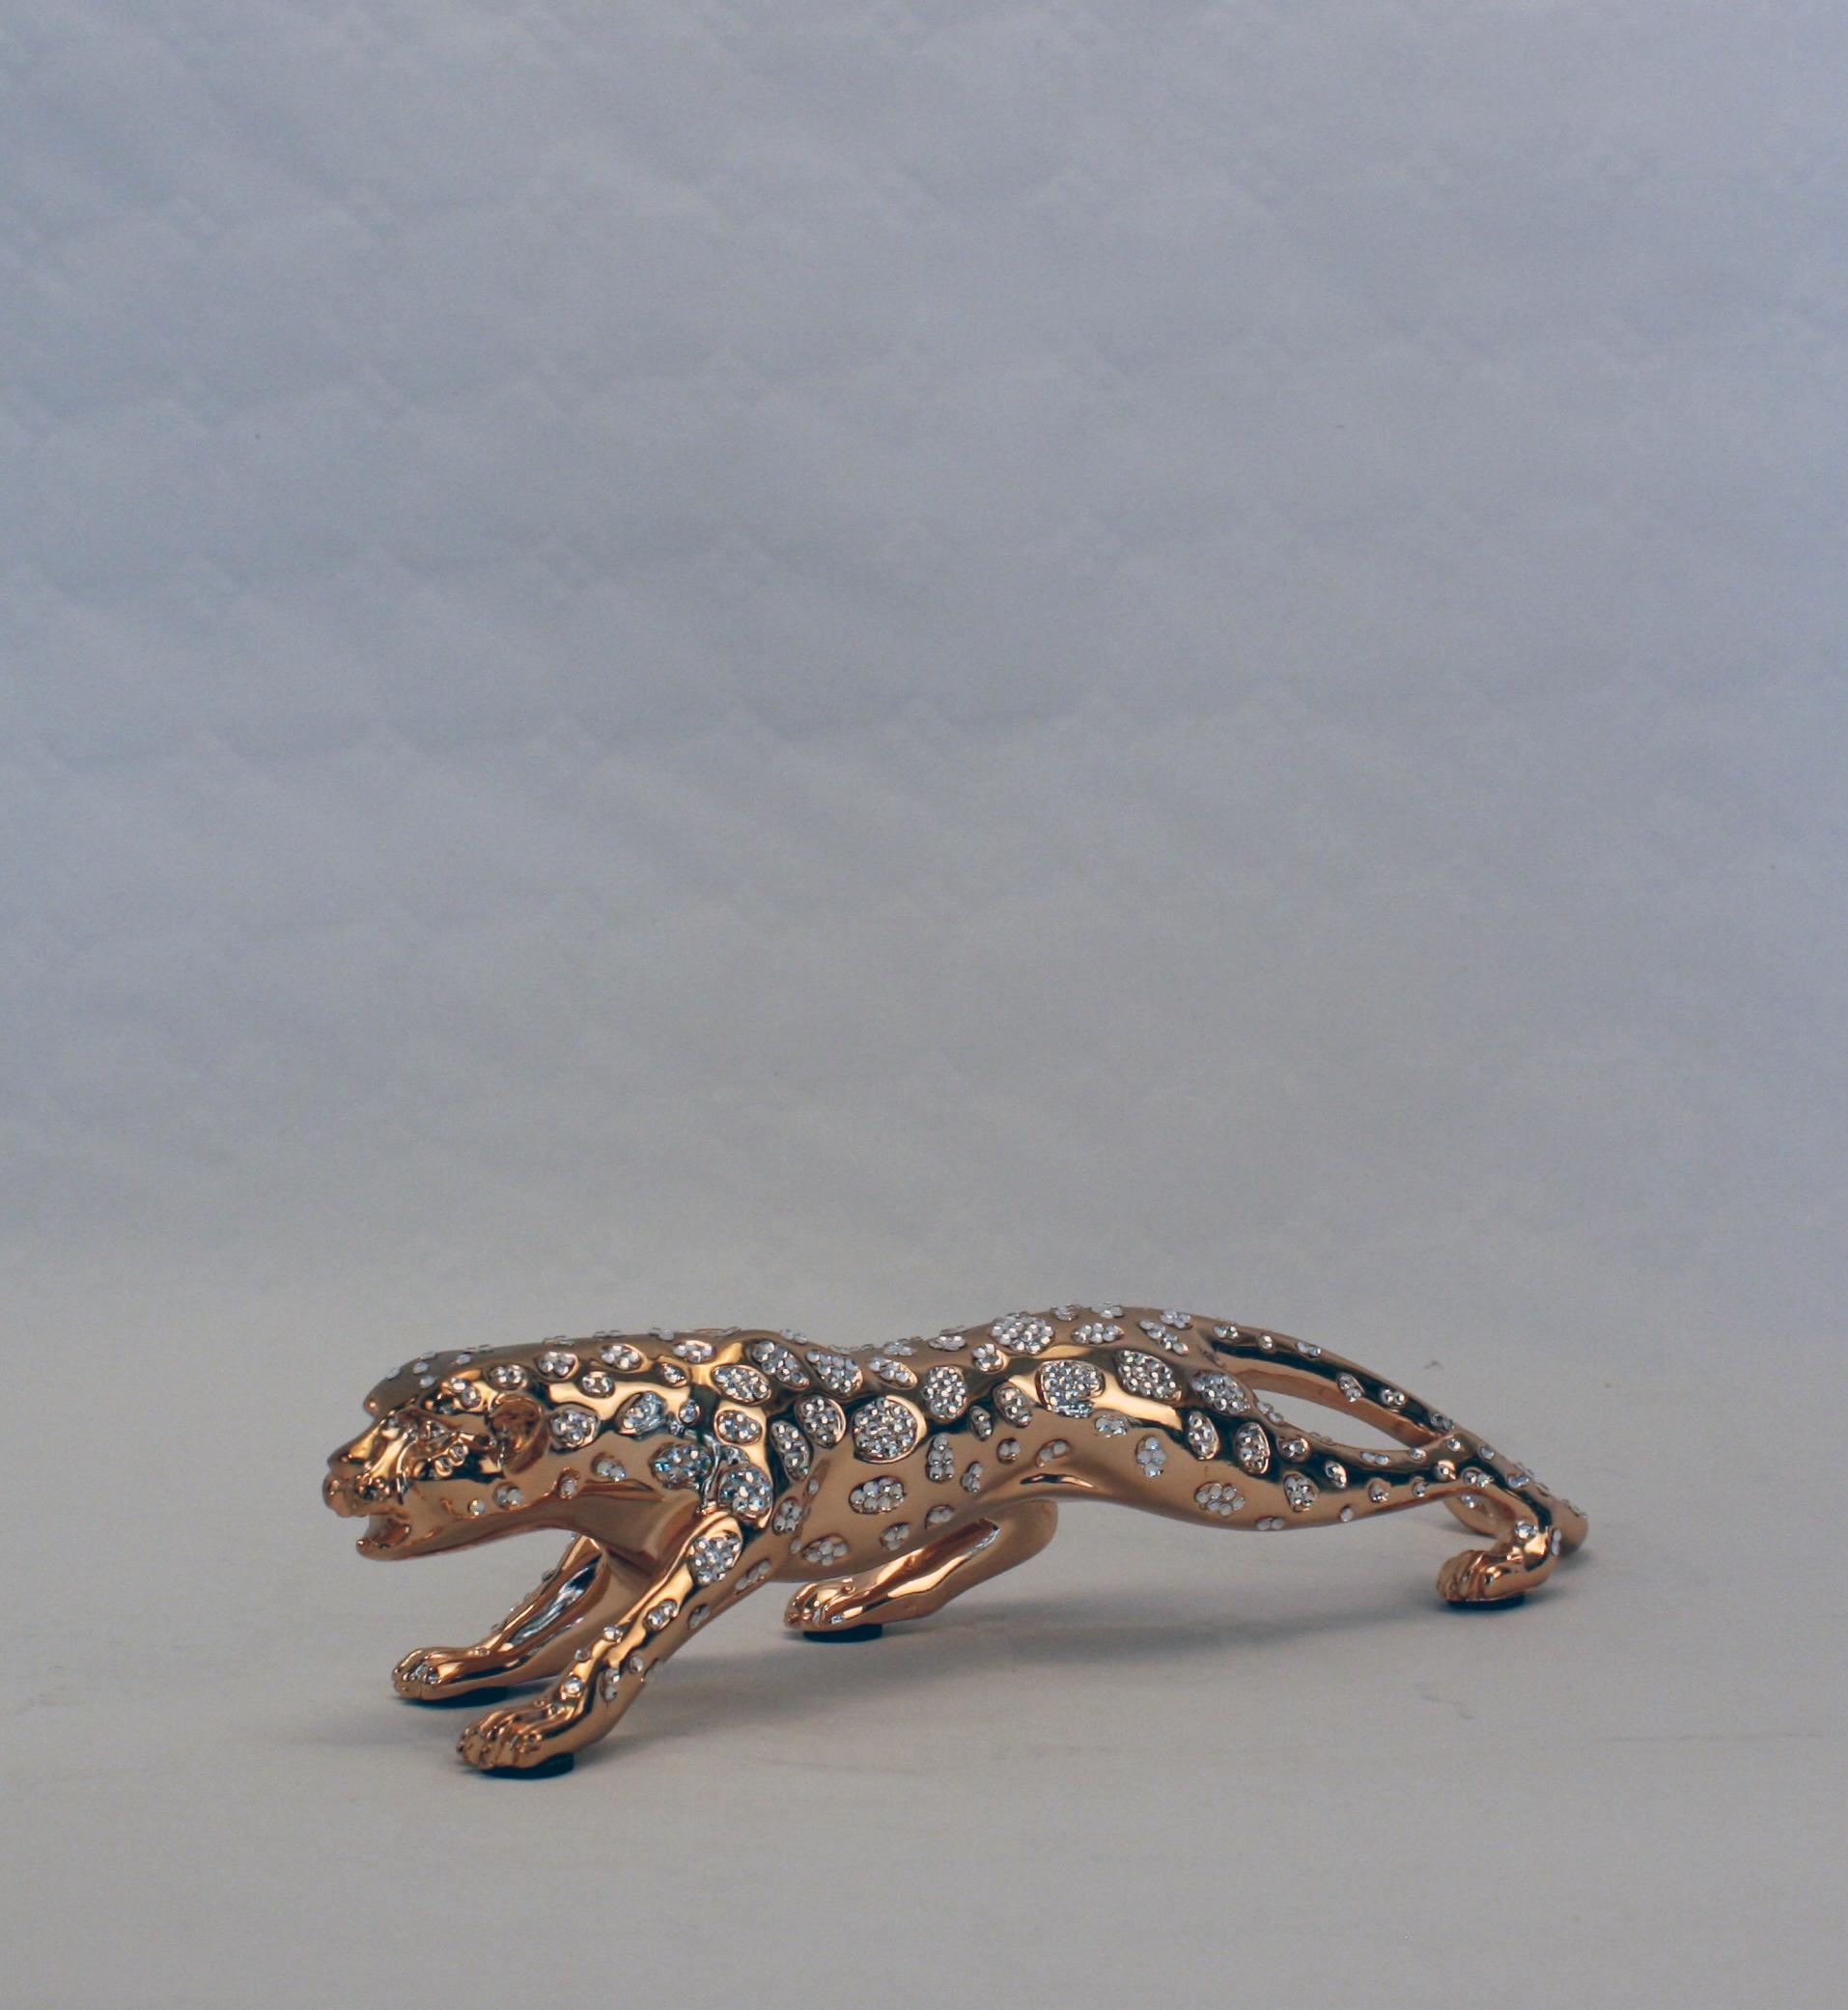 Leopard - Guld med diamanter - Lille - 1